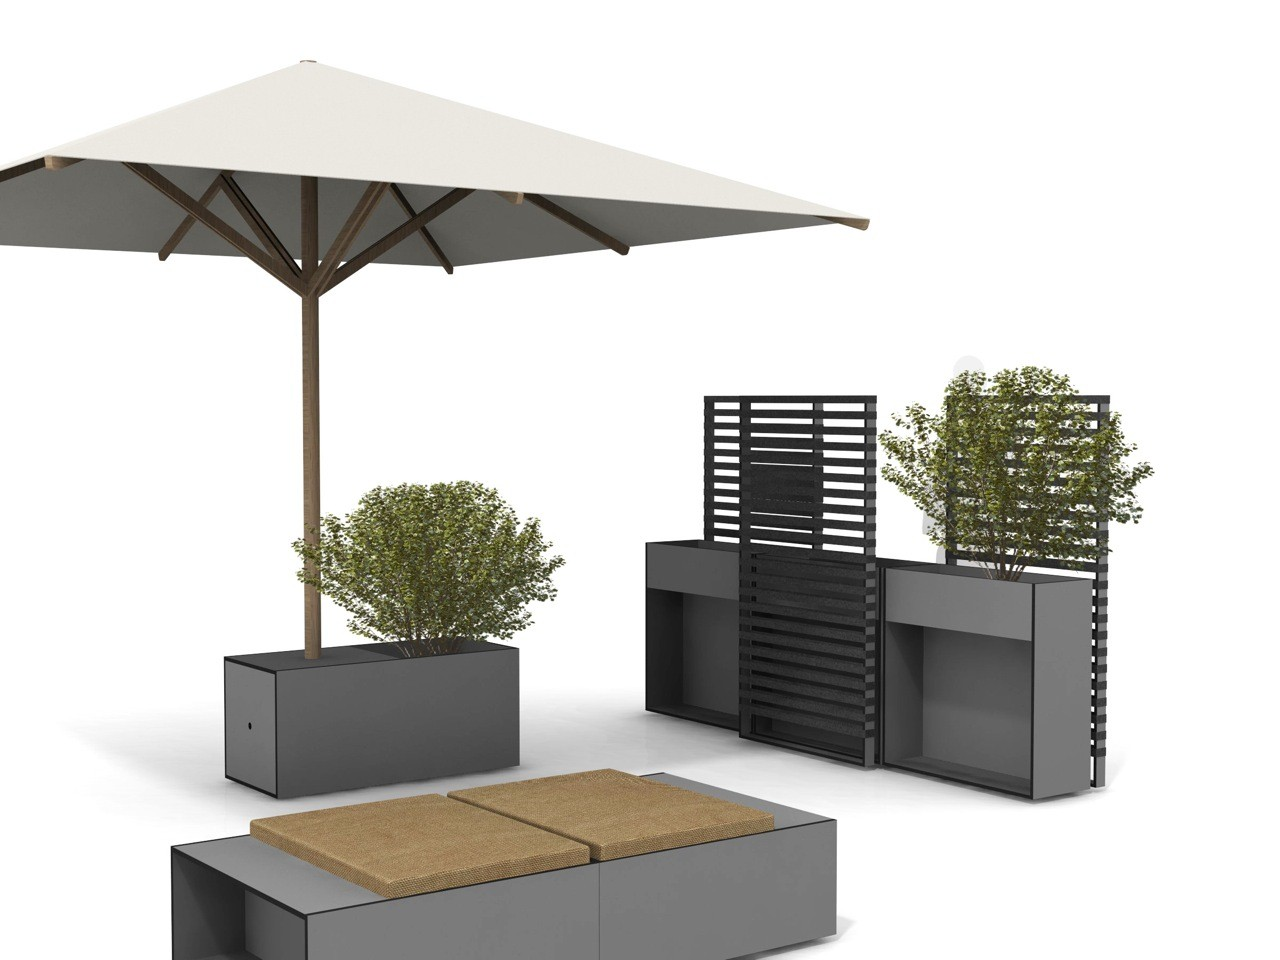 Ticino schermo divisorio da giardino collezione ticino by for Divisori da giardino